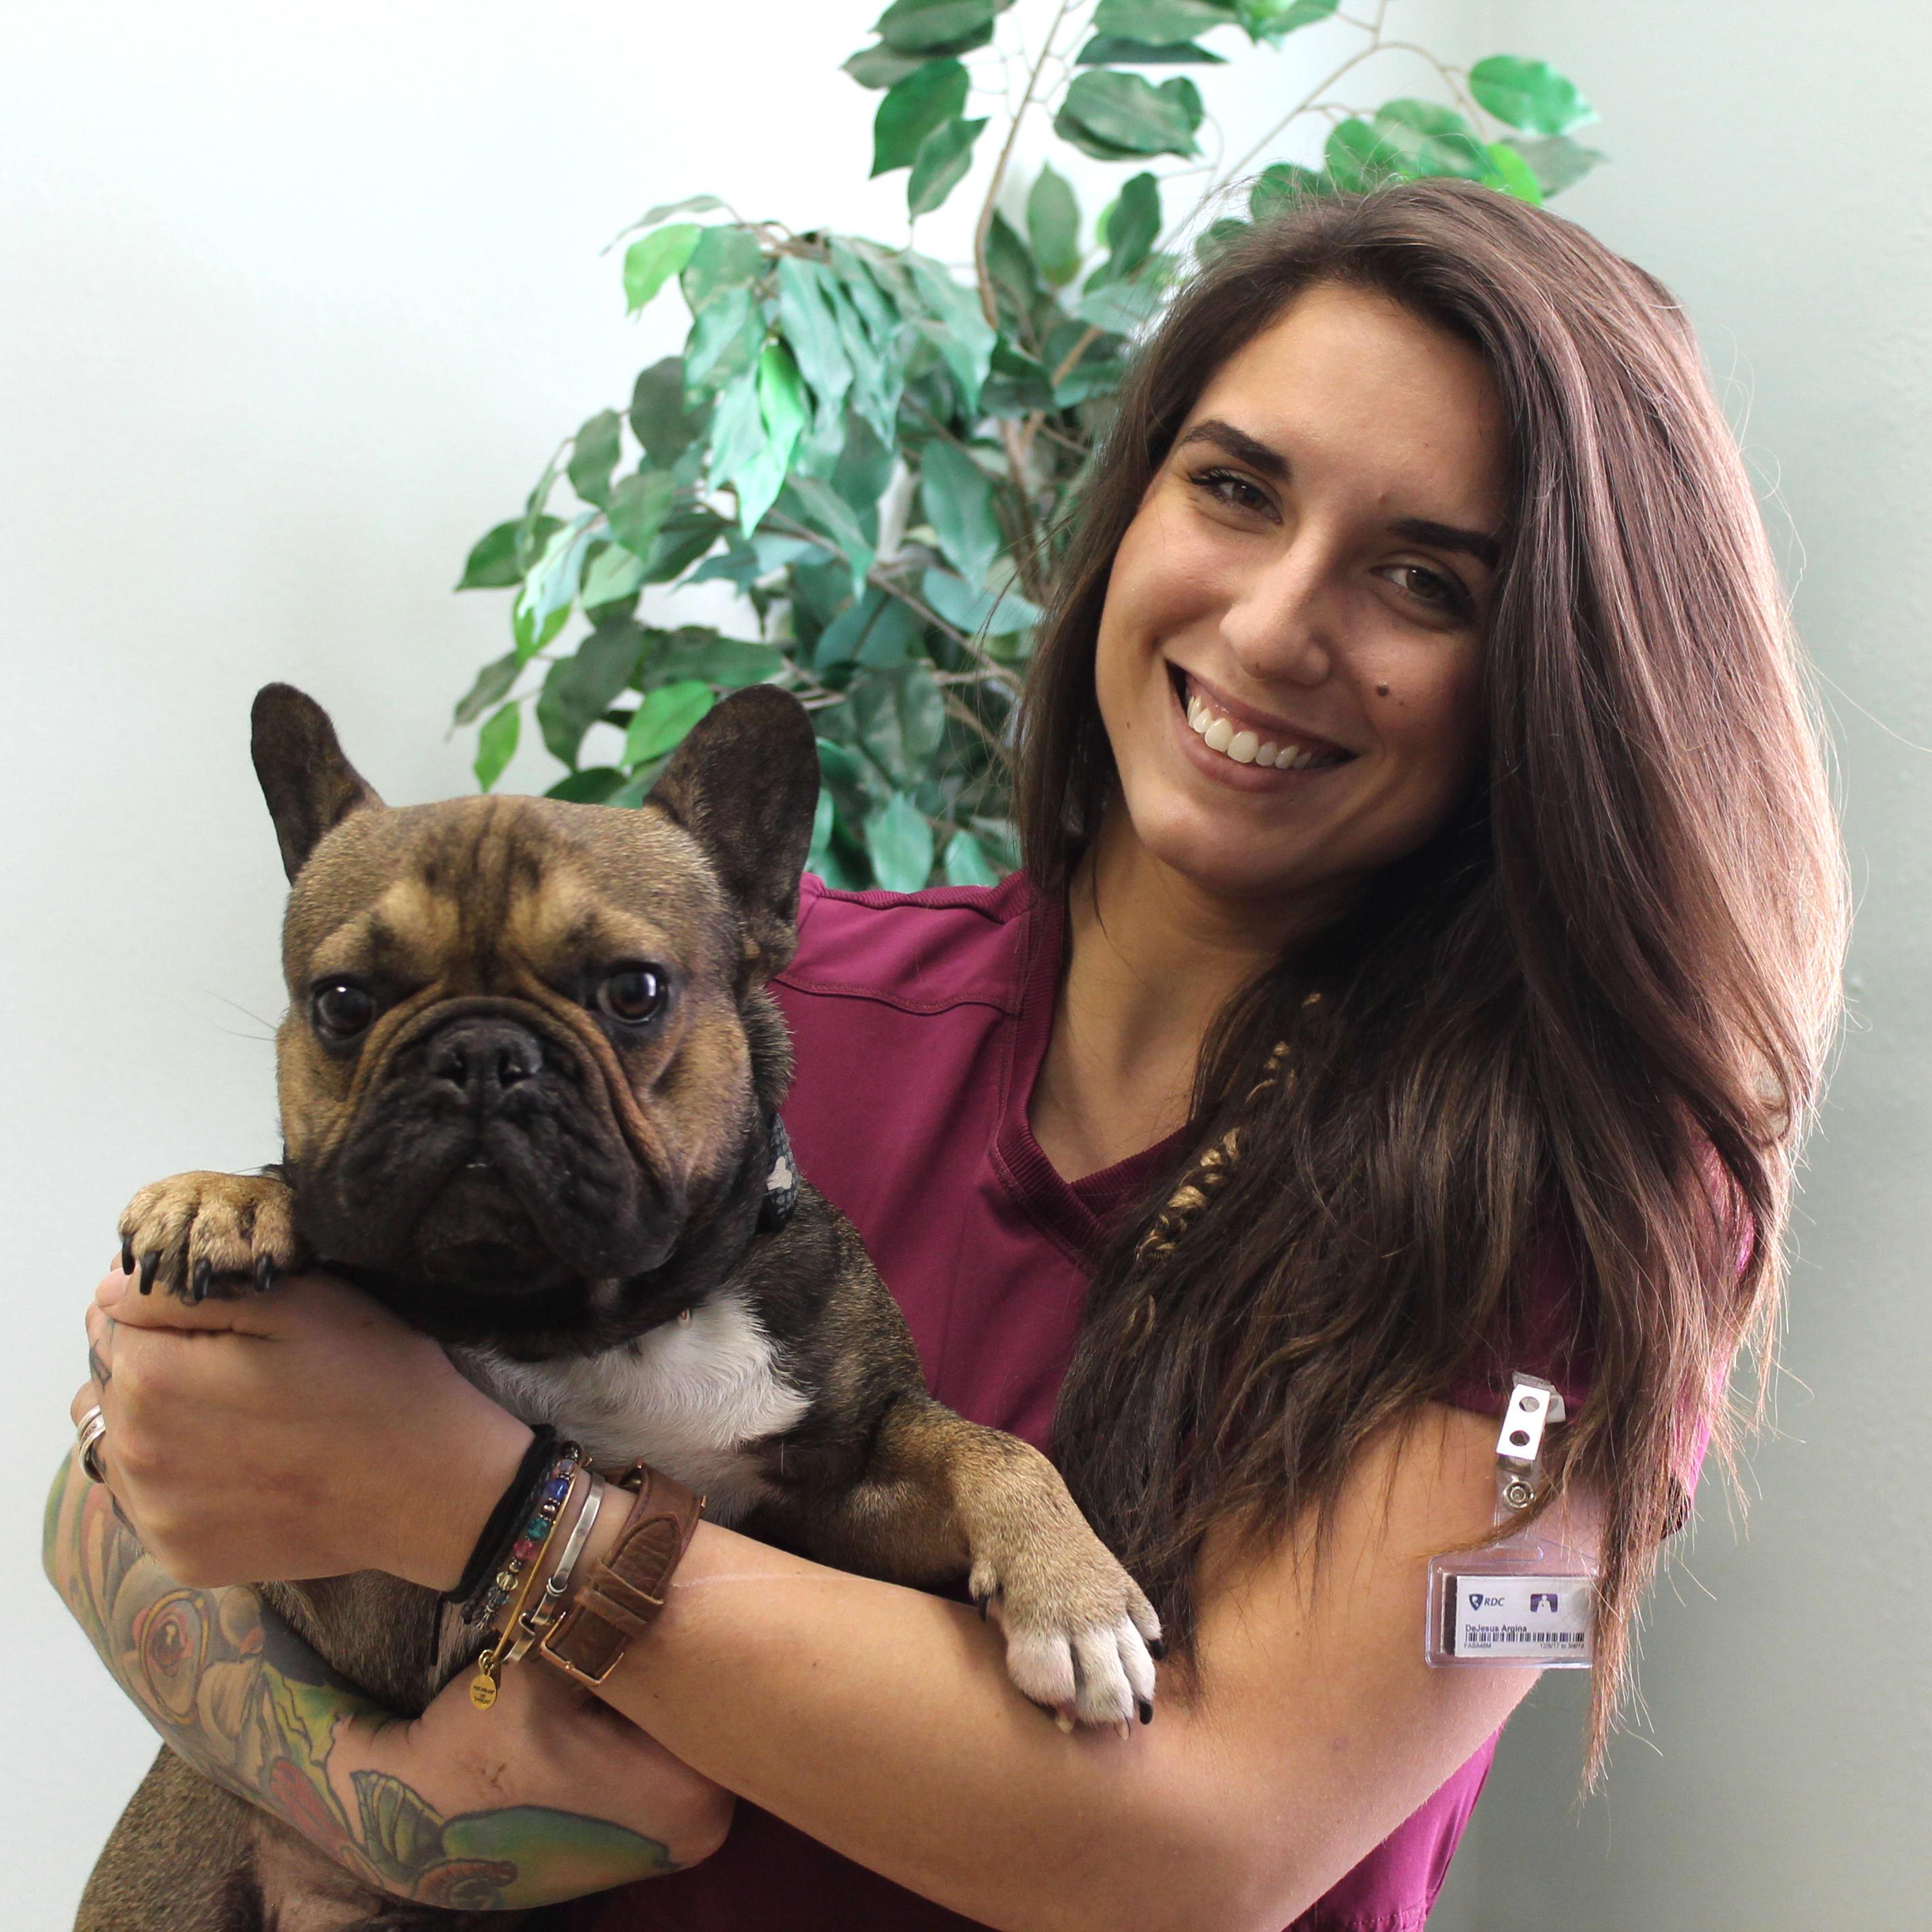 Team member Gina at University Animal Hospital